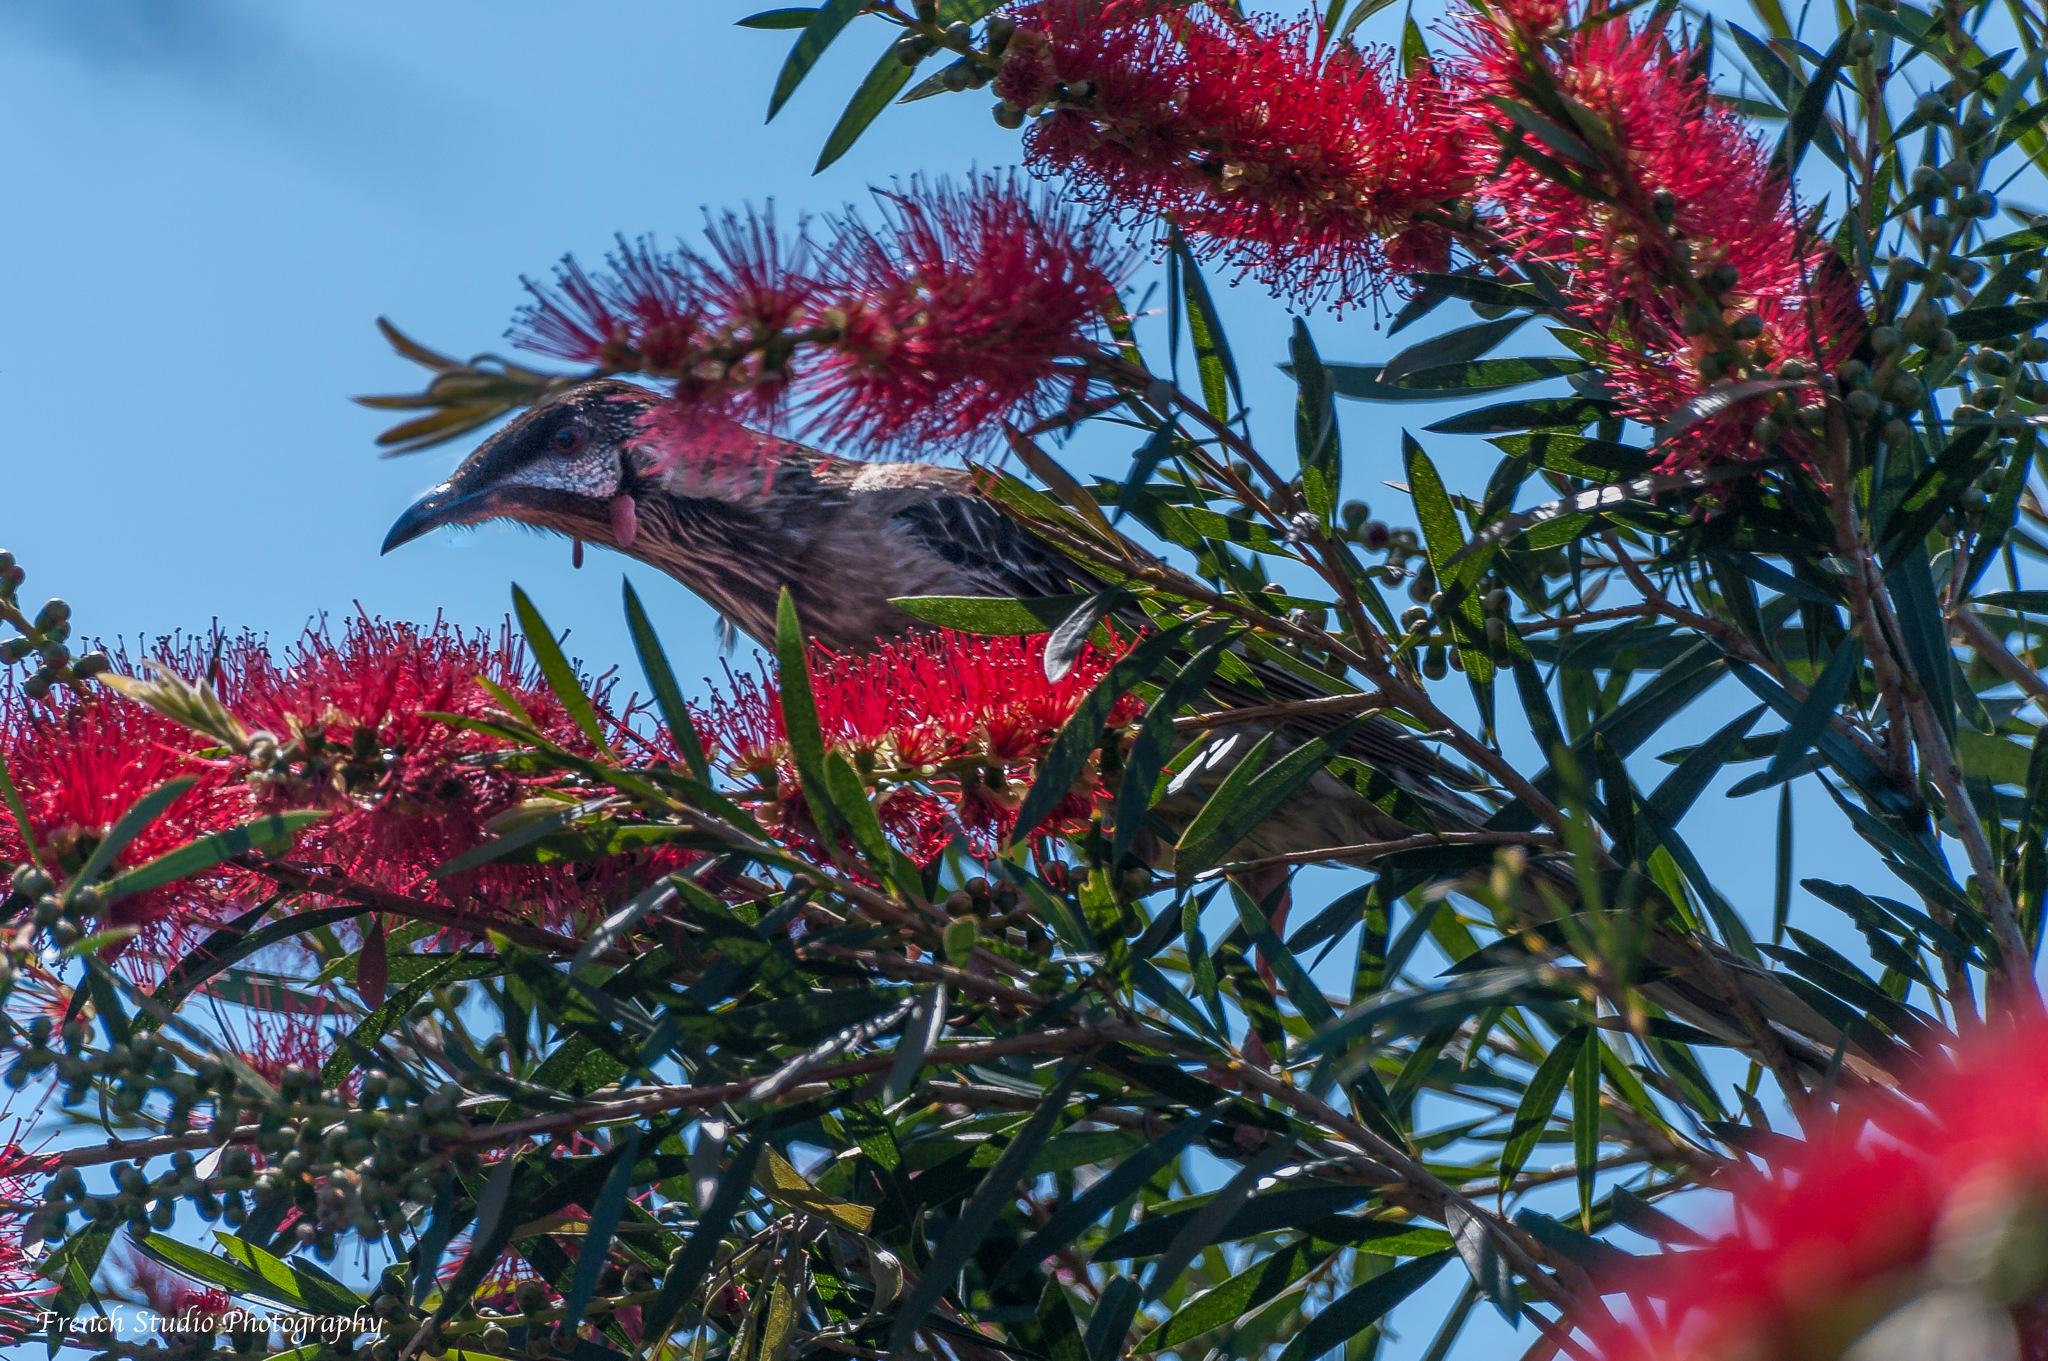 The bird by gerardrotse